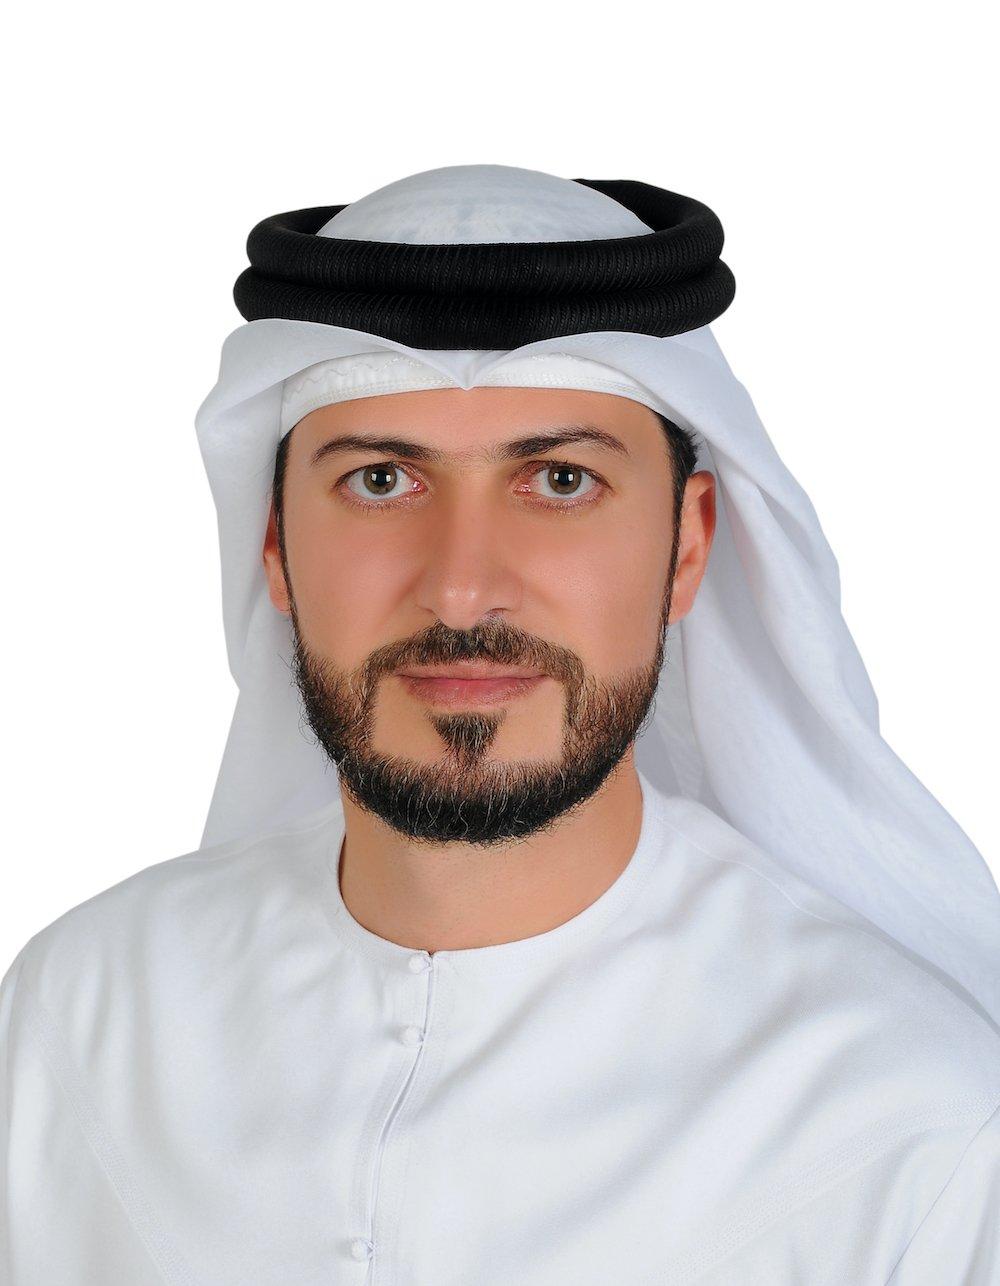 Mustafa Al Zarooni